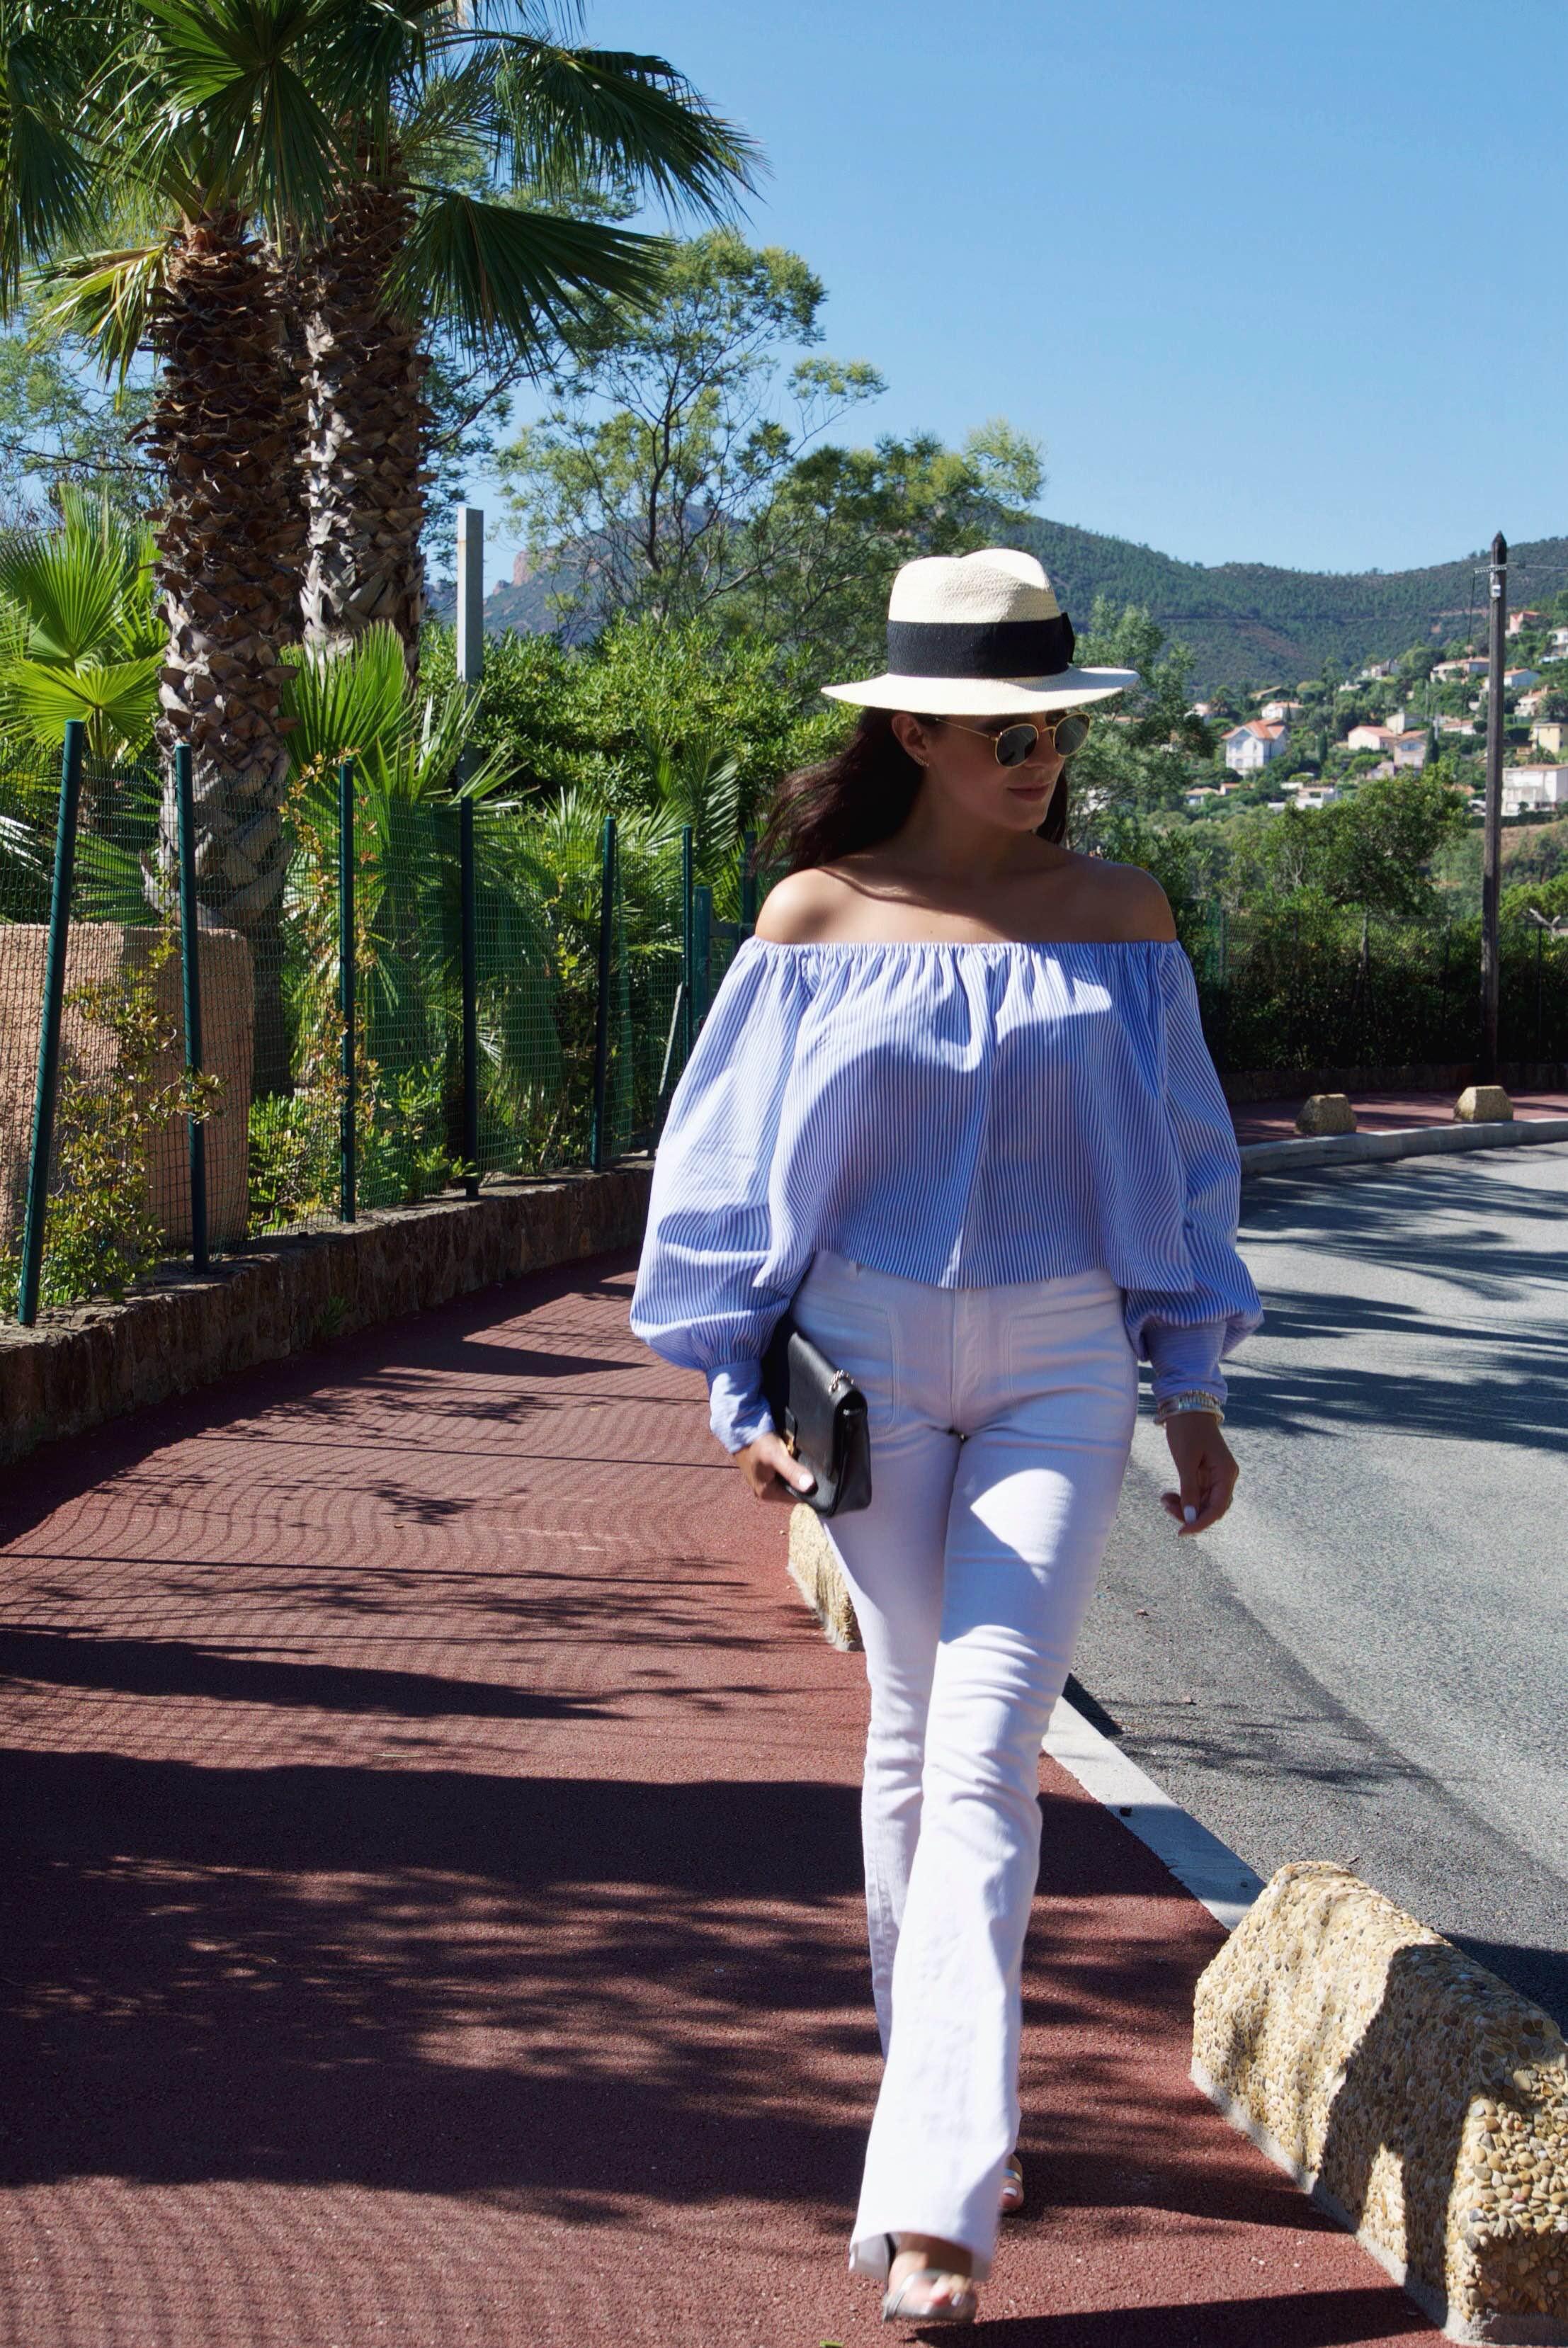 03-Tiara-Miramar-Beach-Hotel-Spa-Cote-dAzur-Yllka-Brada-Collaboration-Disi-Couture